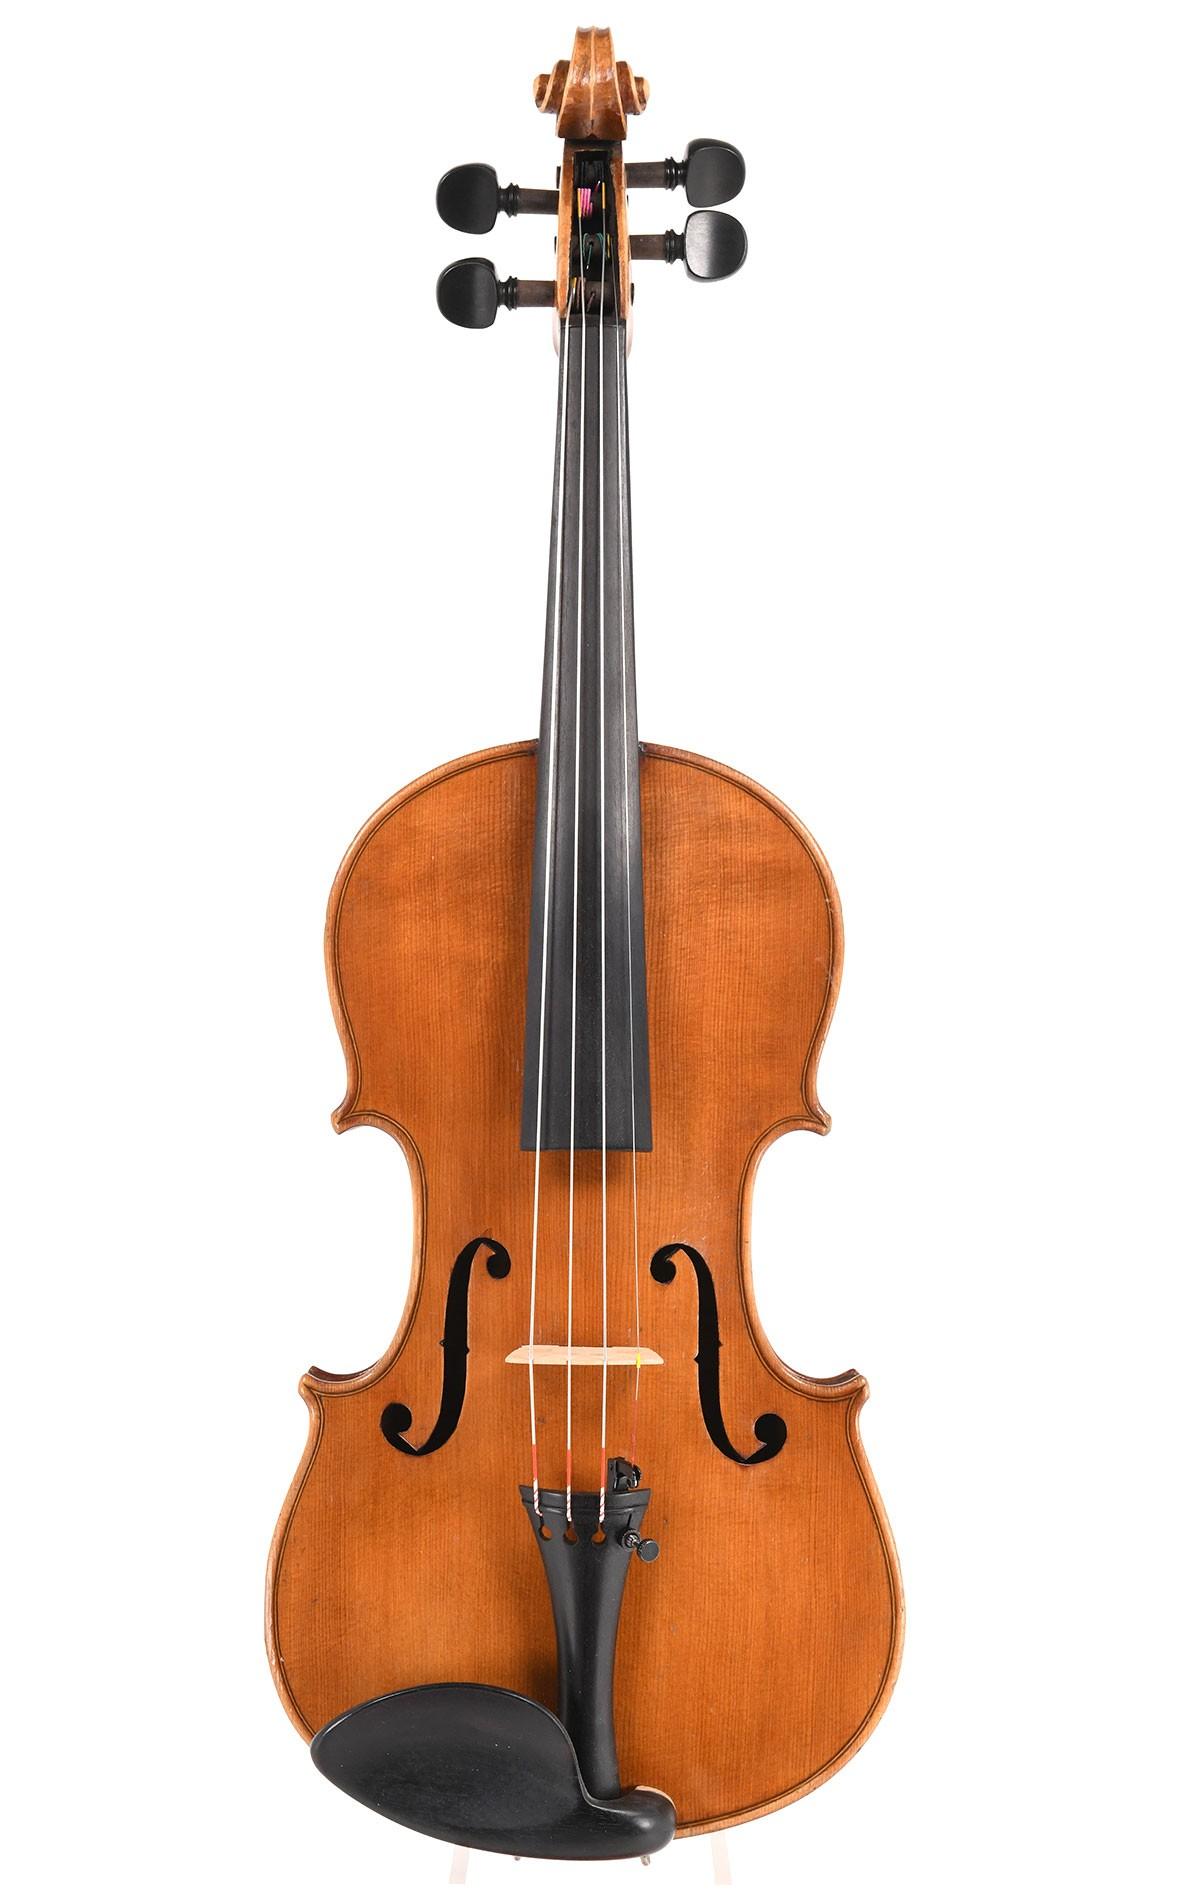 Old 3/4 violin from Markneukirchen